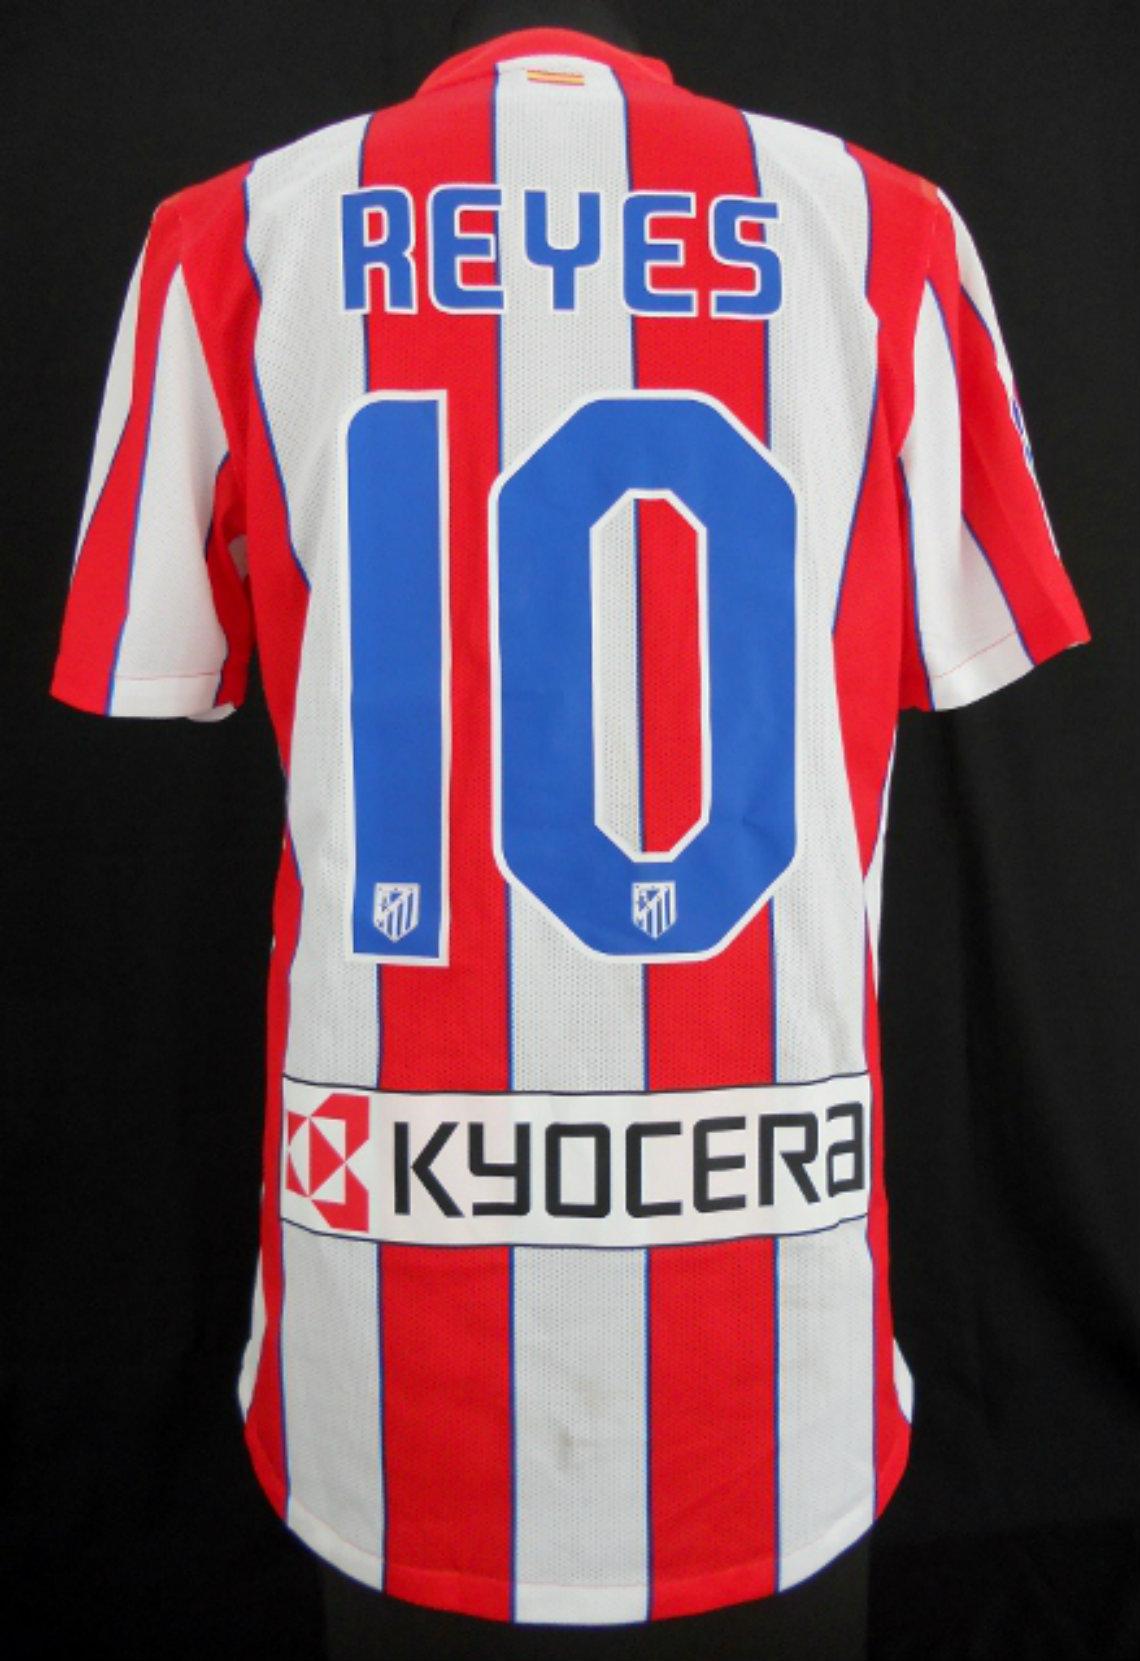 Chùm ảnh: Valladolid jersey (63)